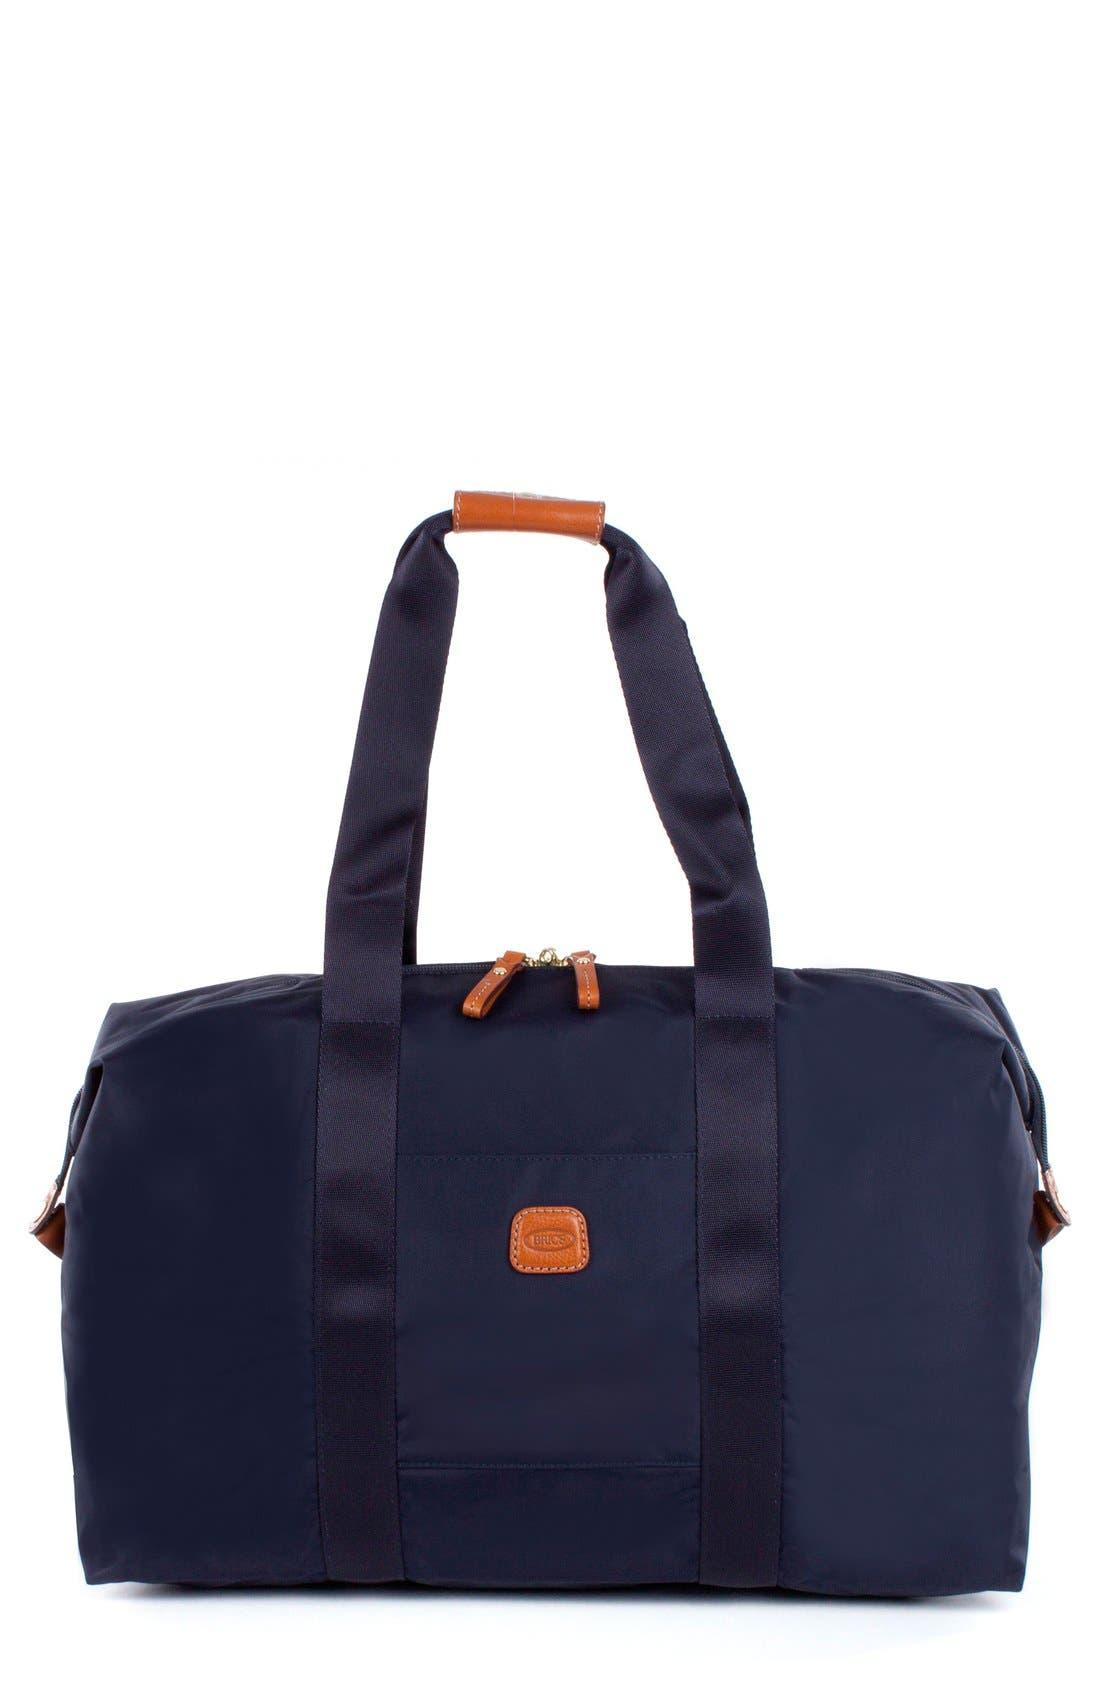 'X-Bag' Folding Duffel Bag,                             Main thumbnail 1, color,                             410